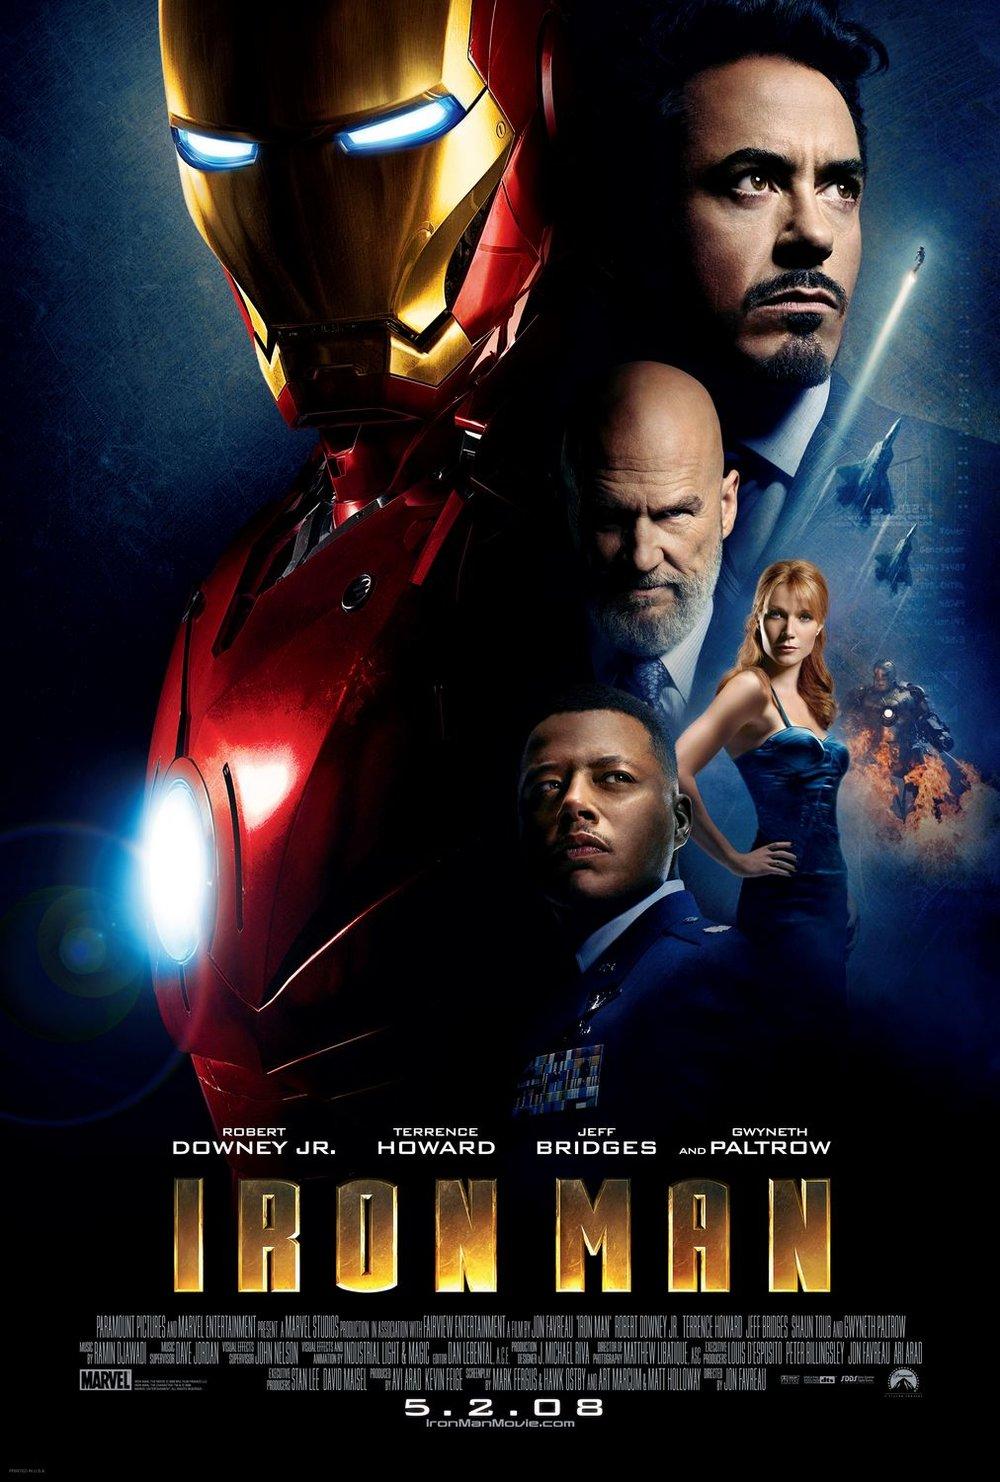 iron-man-movie-poster-marvel-cinematic-universe-1038878.jpg